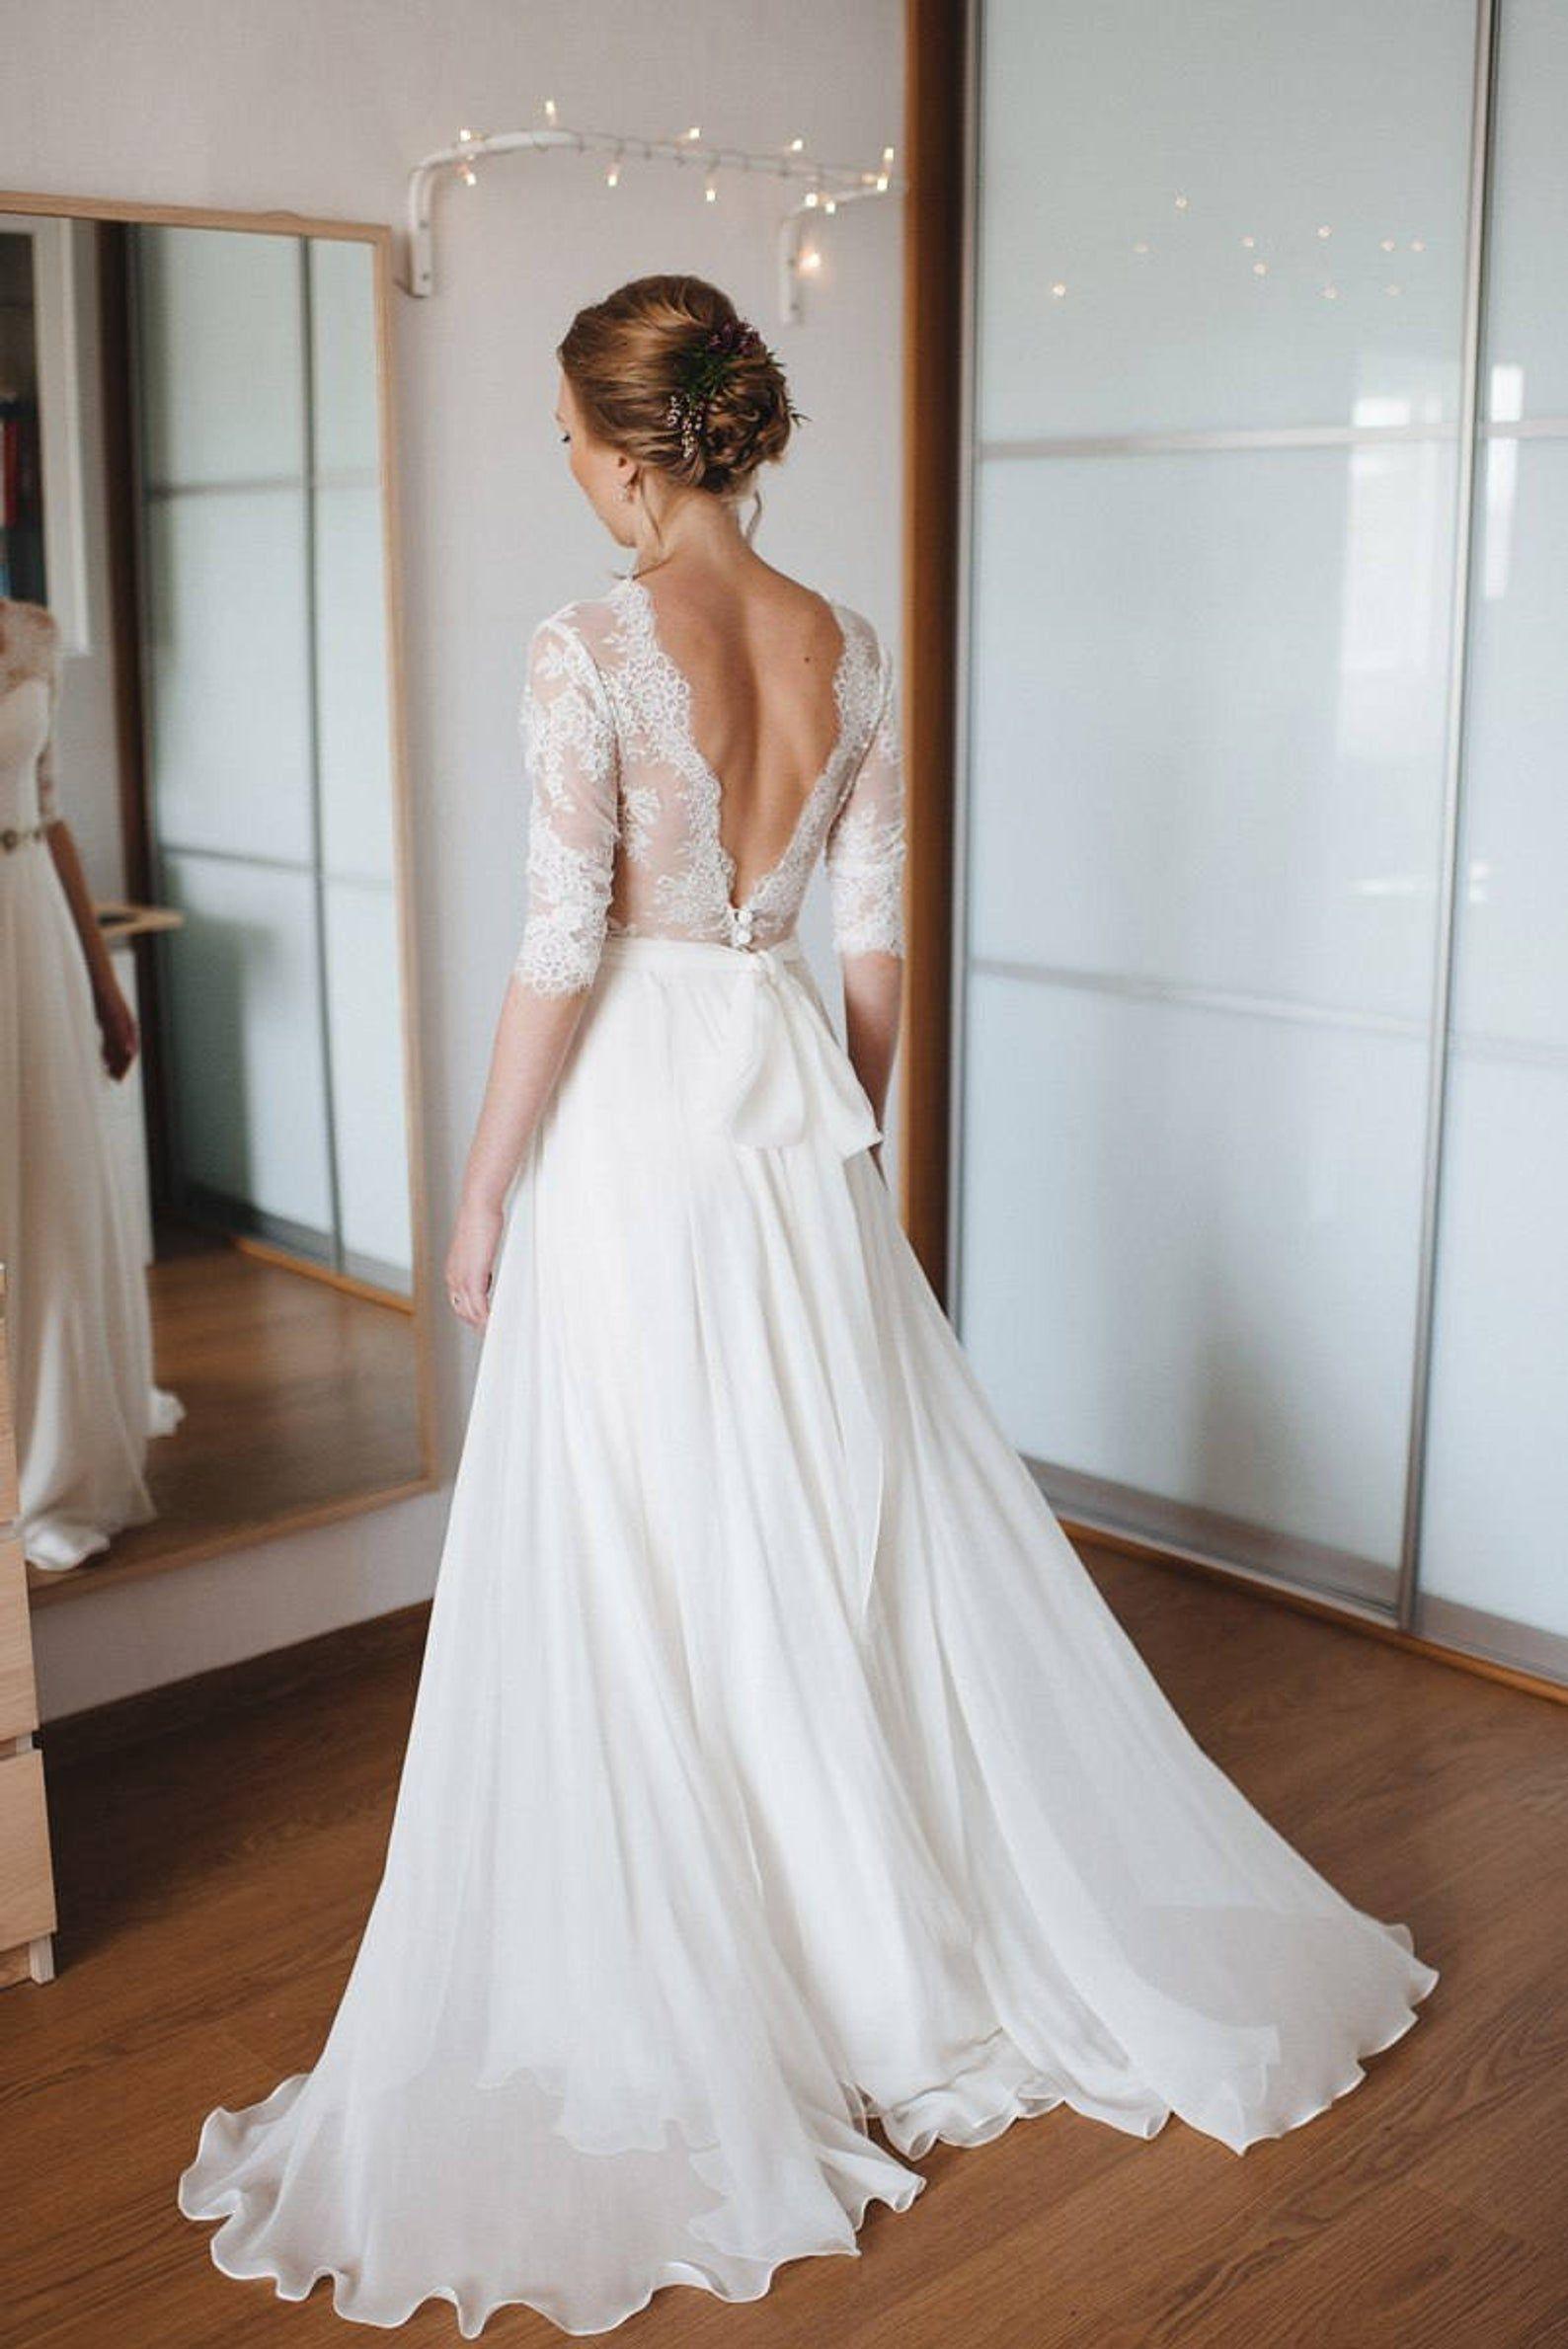 Pin By Ashleighburne On Wedding In 2020 Etsy Wedding Dress Wedding Dresses Wedding Dresses Lace